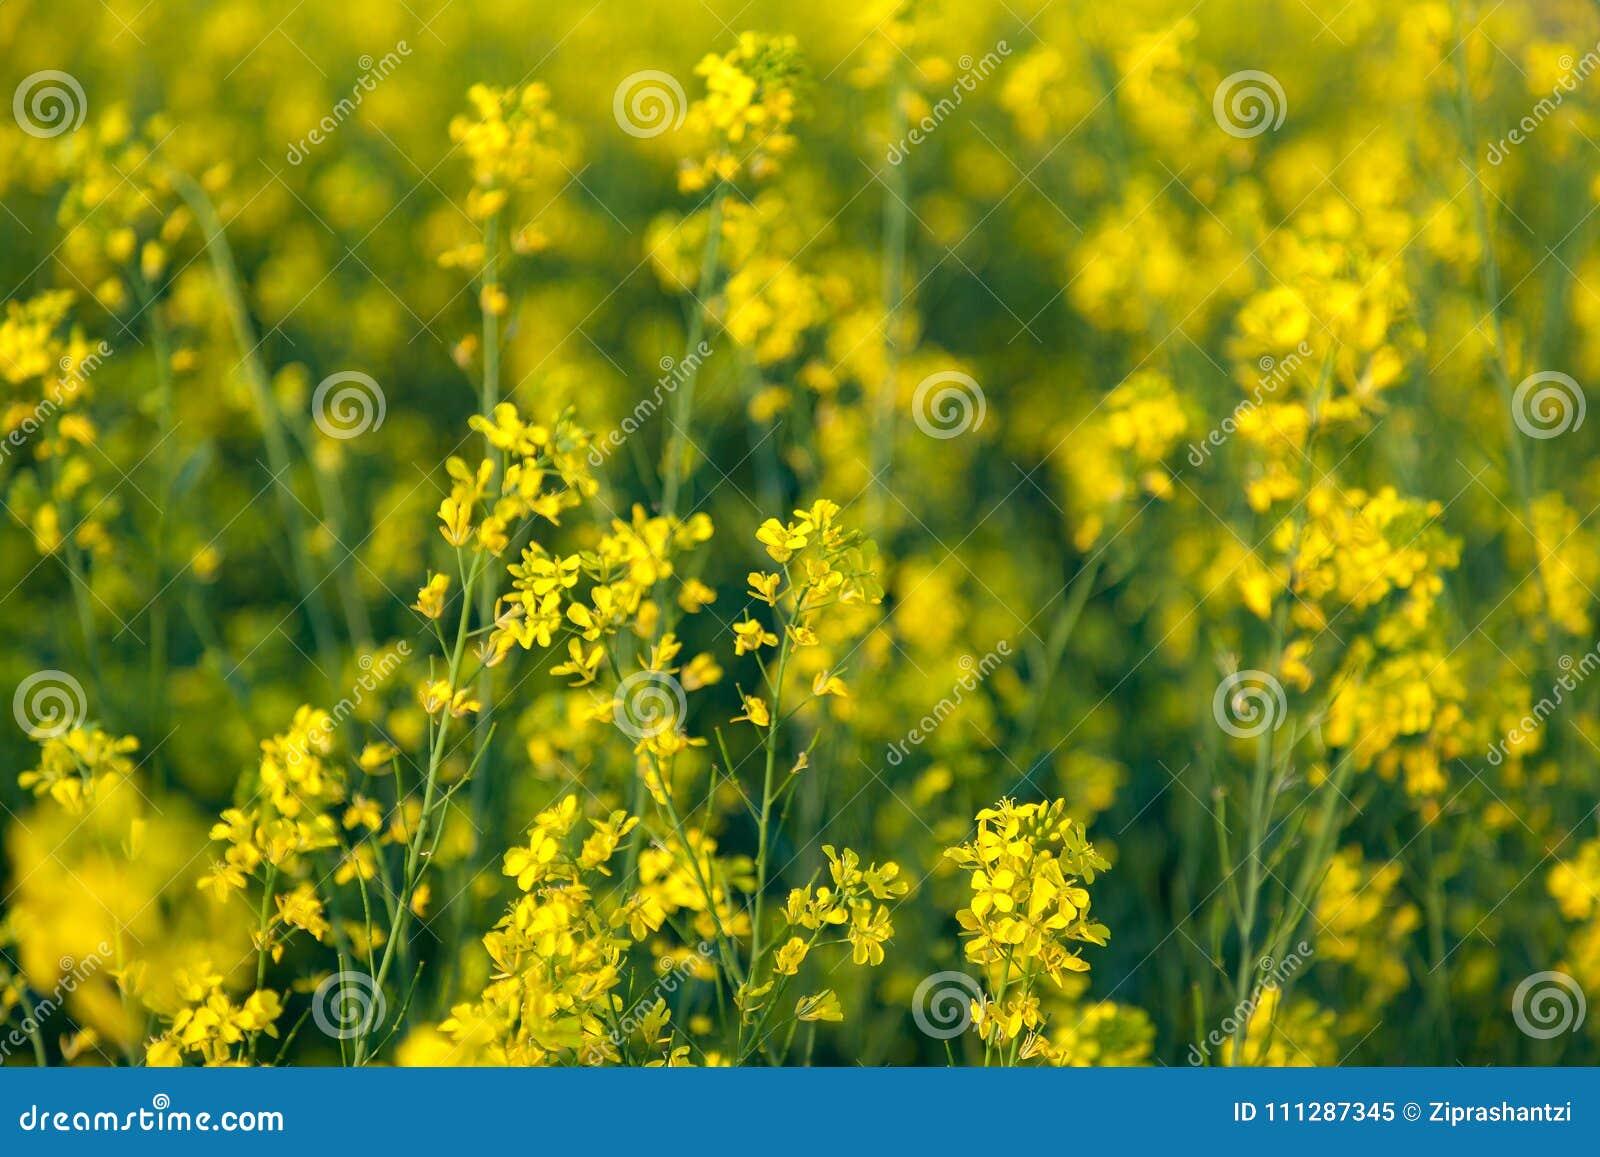 Beautiful Organic Yellow Mustard Flowers In Field Stock Image